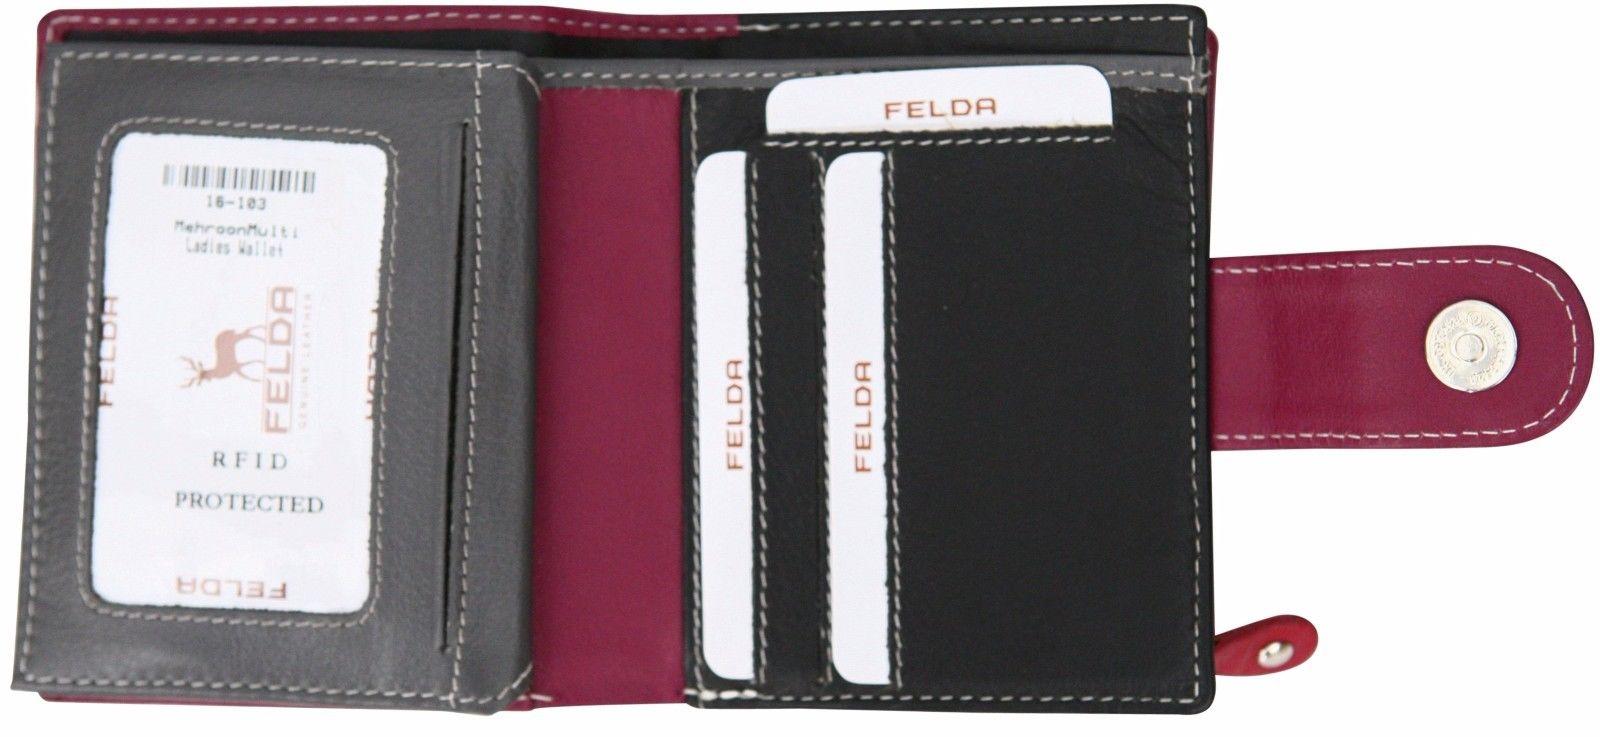 Felda-RFID-onorevoli-MEDAGLIA-amp-Card-Purse-Wallet-Genuine-Leather-Multi-SOFT-BOX-REGALO miniatura 46